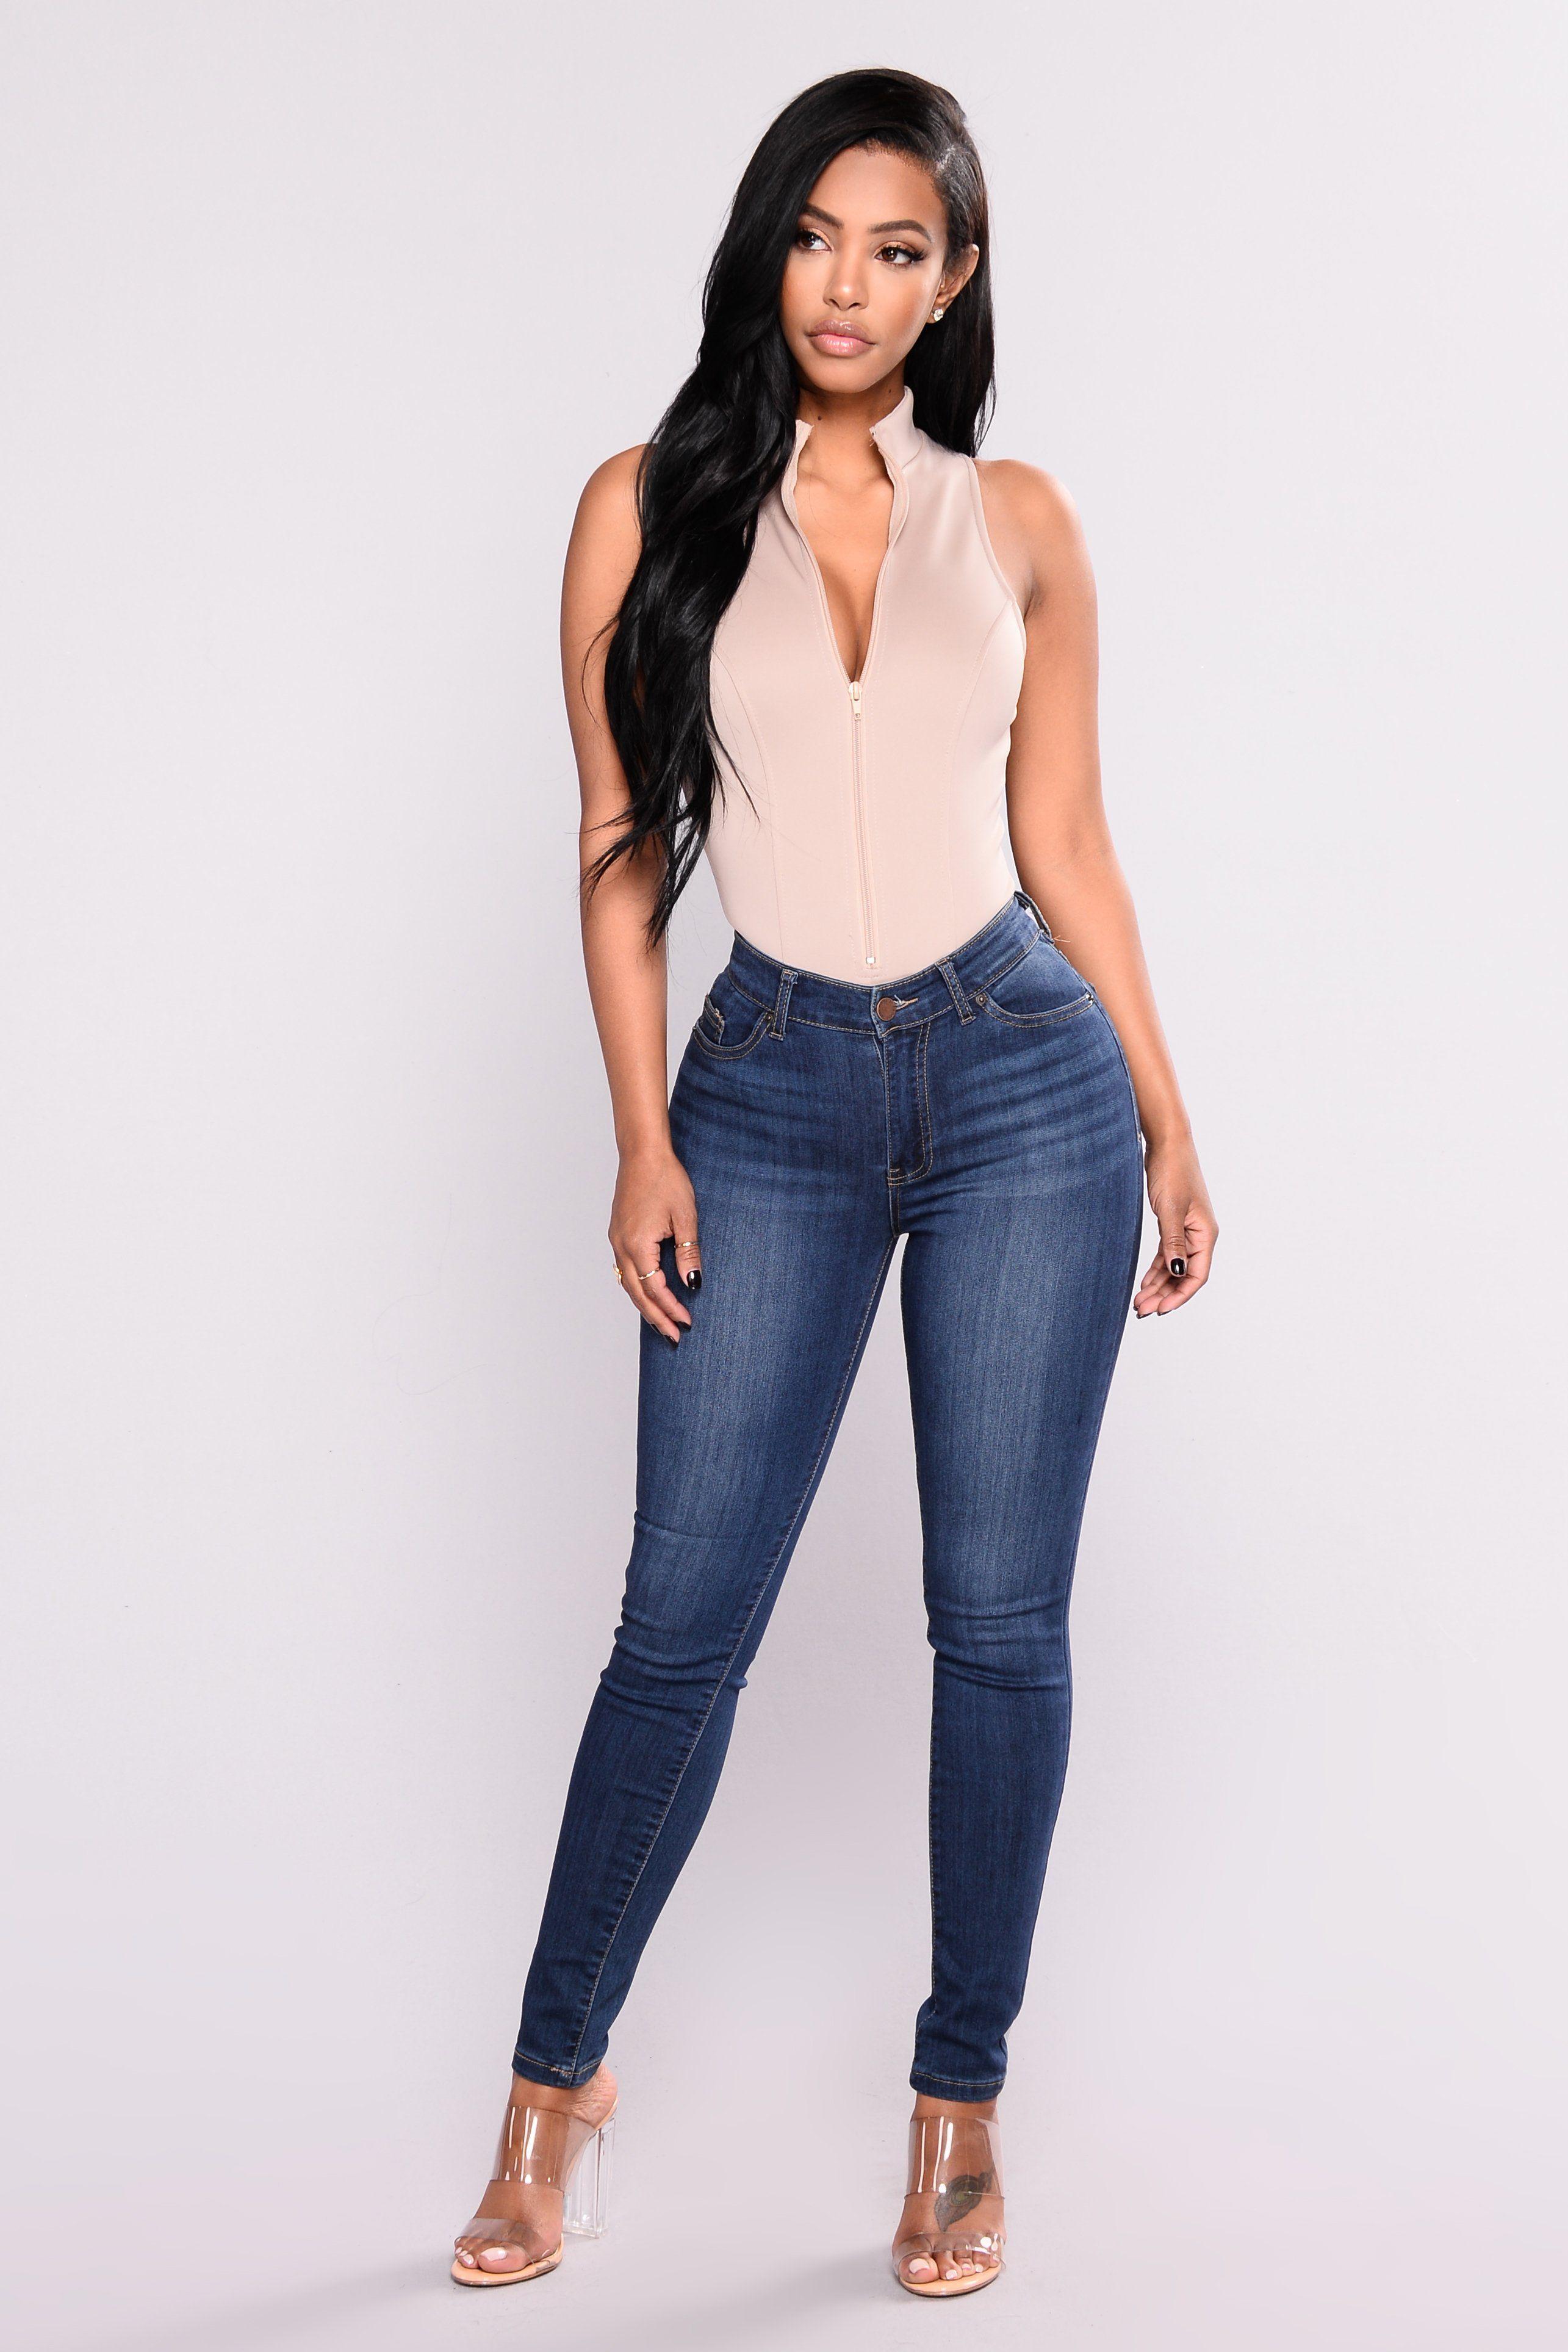 dbef09894 Ezra Skinny Jeans - Dark in 2019 | fashionnova | Skinny jeans, Jeans ...